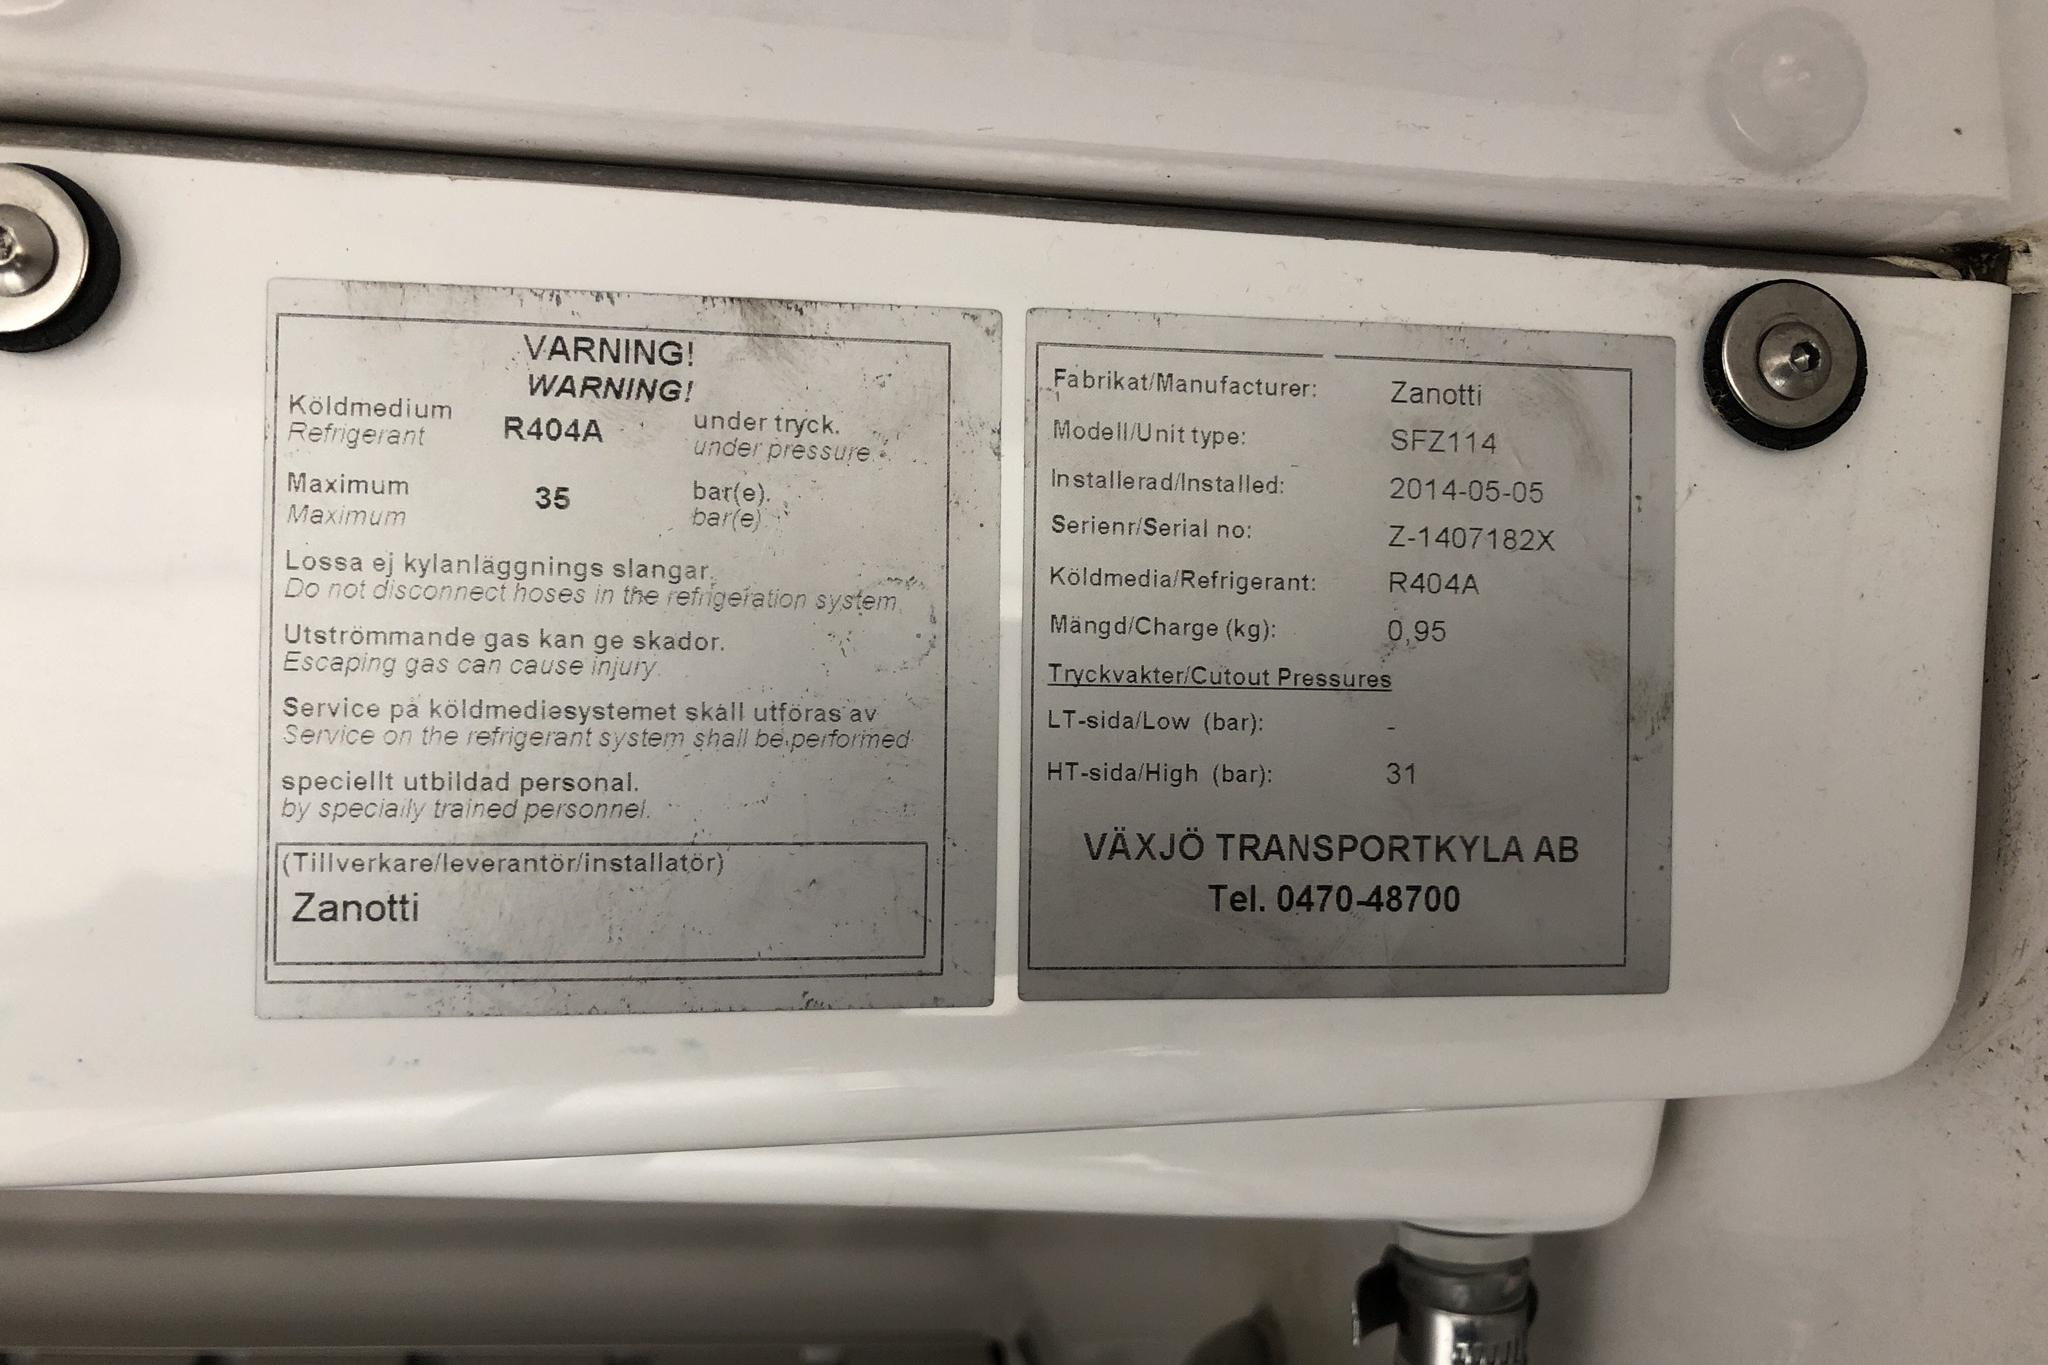 VW Transporter T5 2.0 TDI (140hk) - 80 860 km - Manual - white - 2014